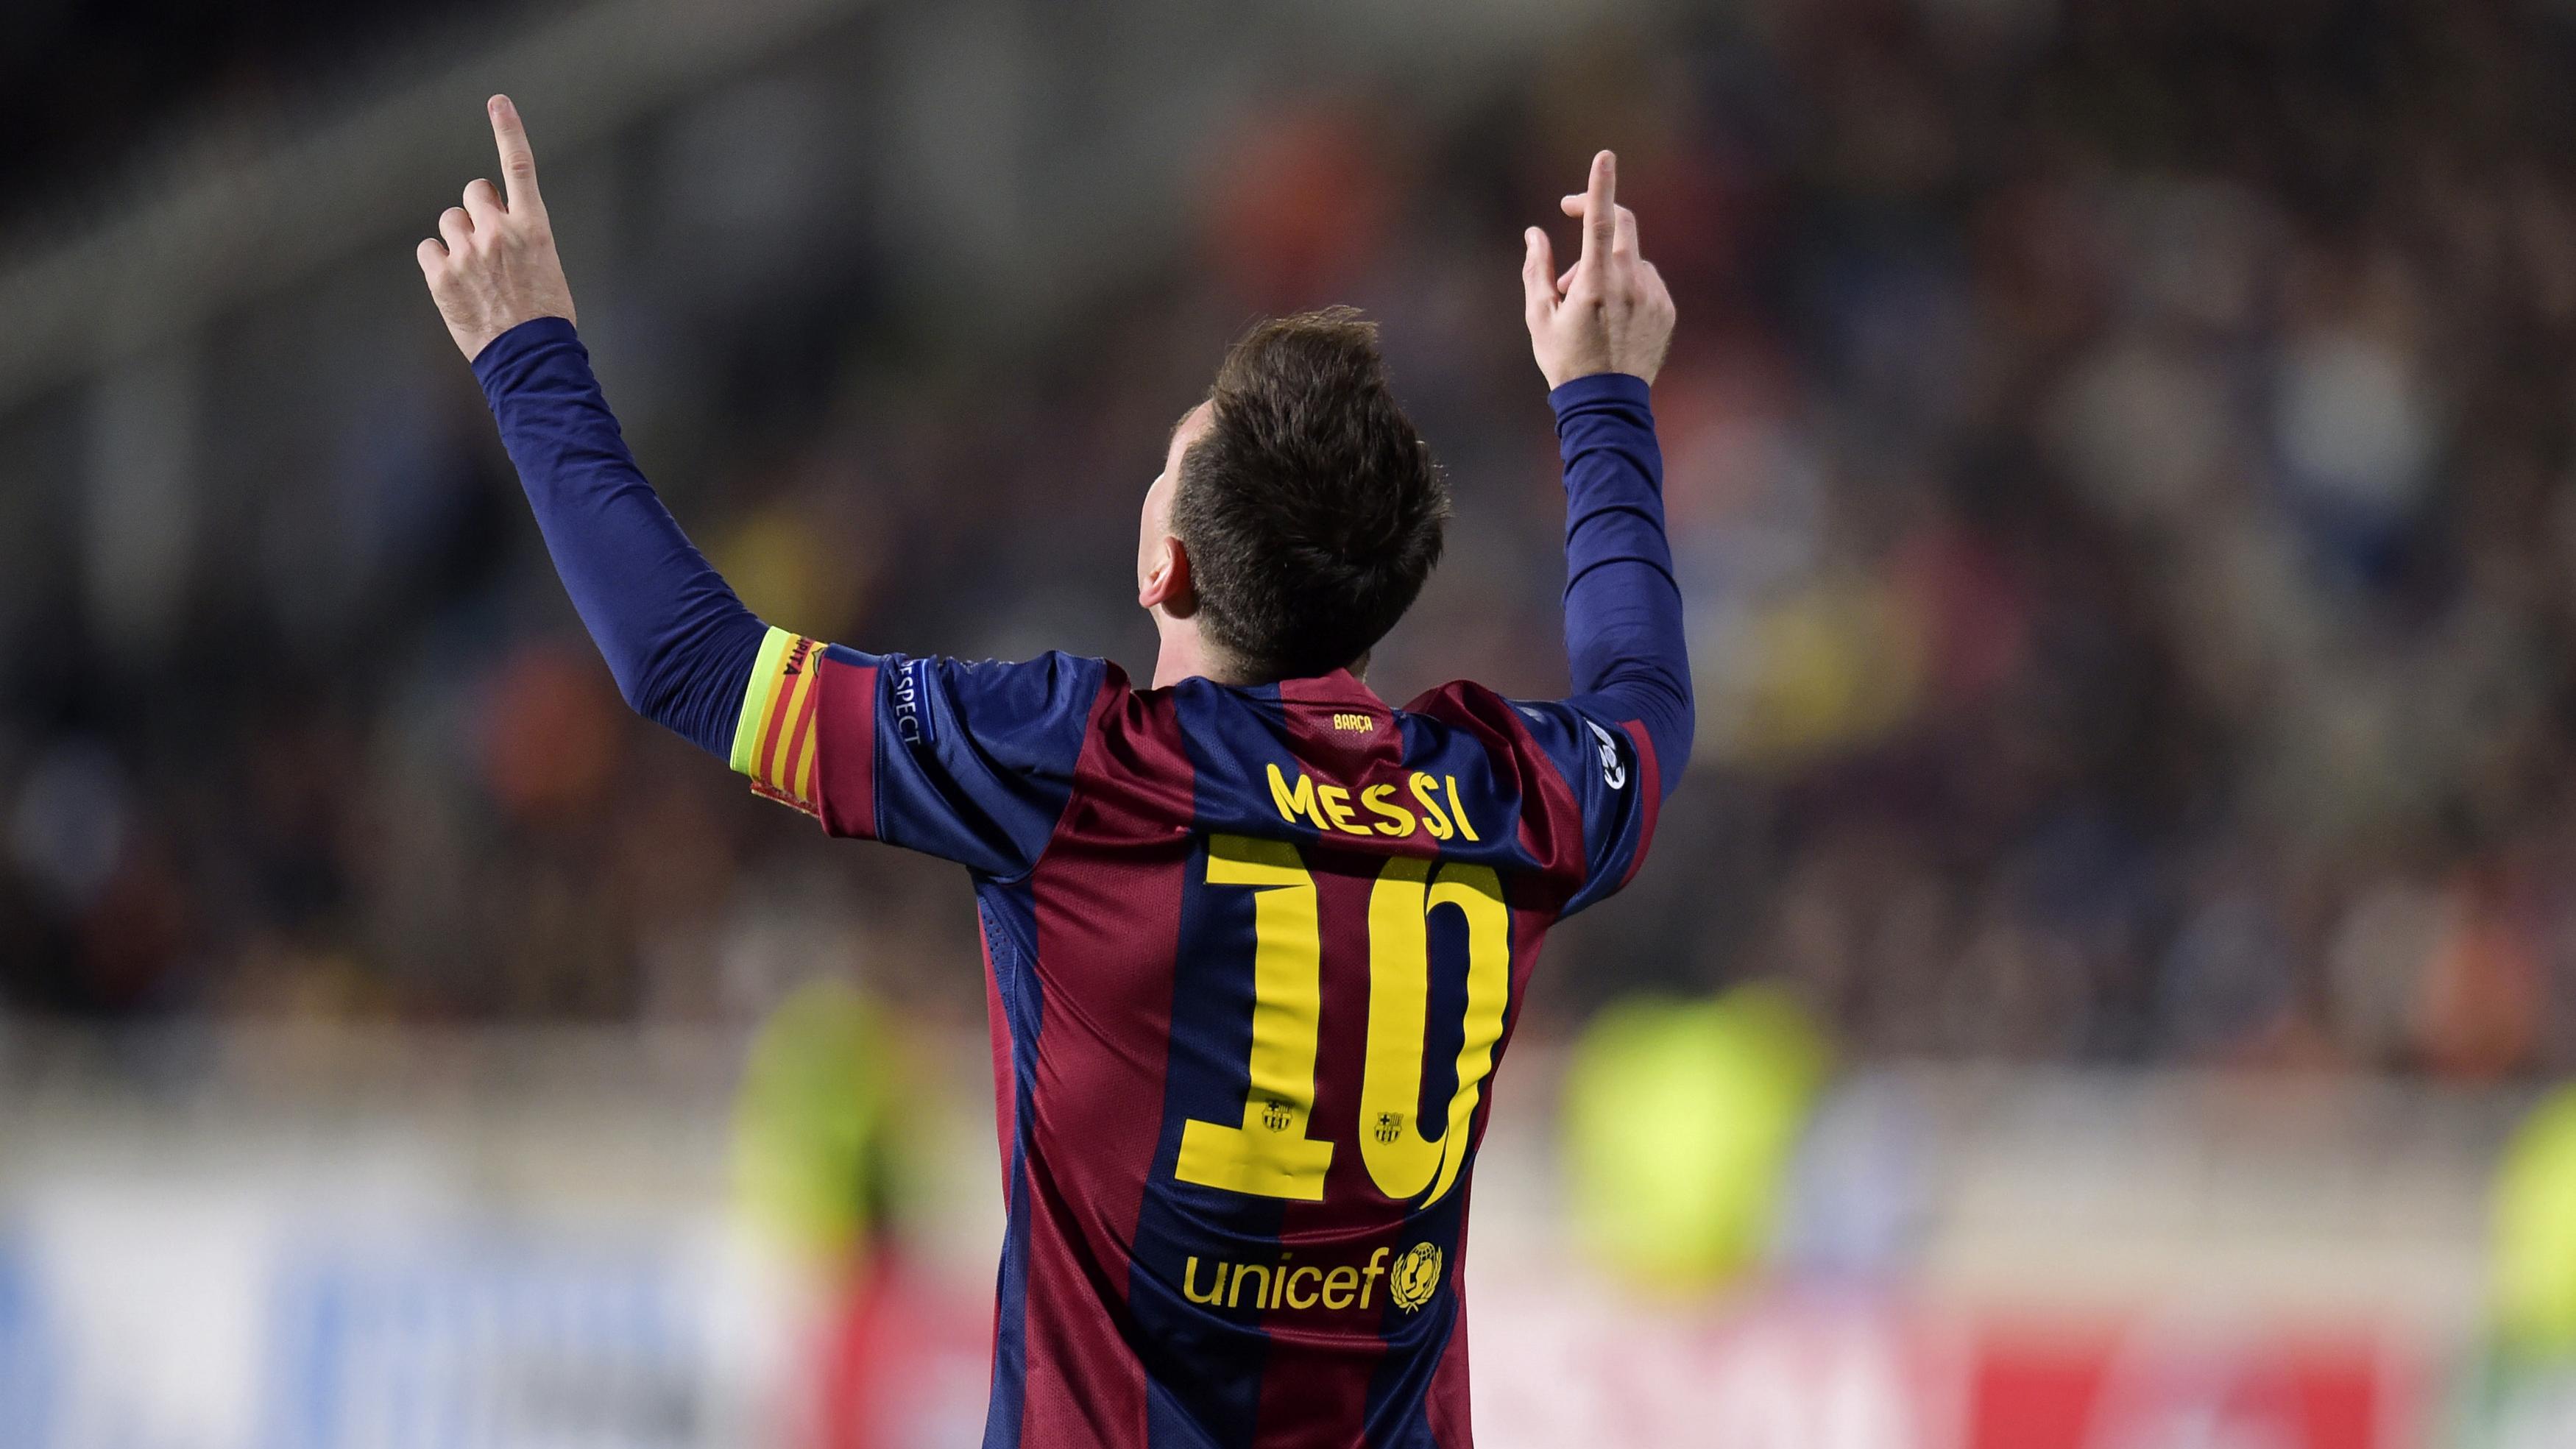 Soccer Celebrations Messi The Image Kid